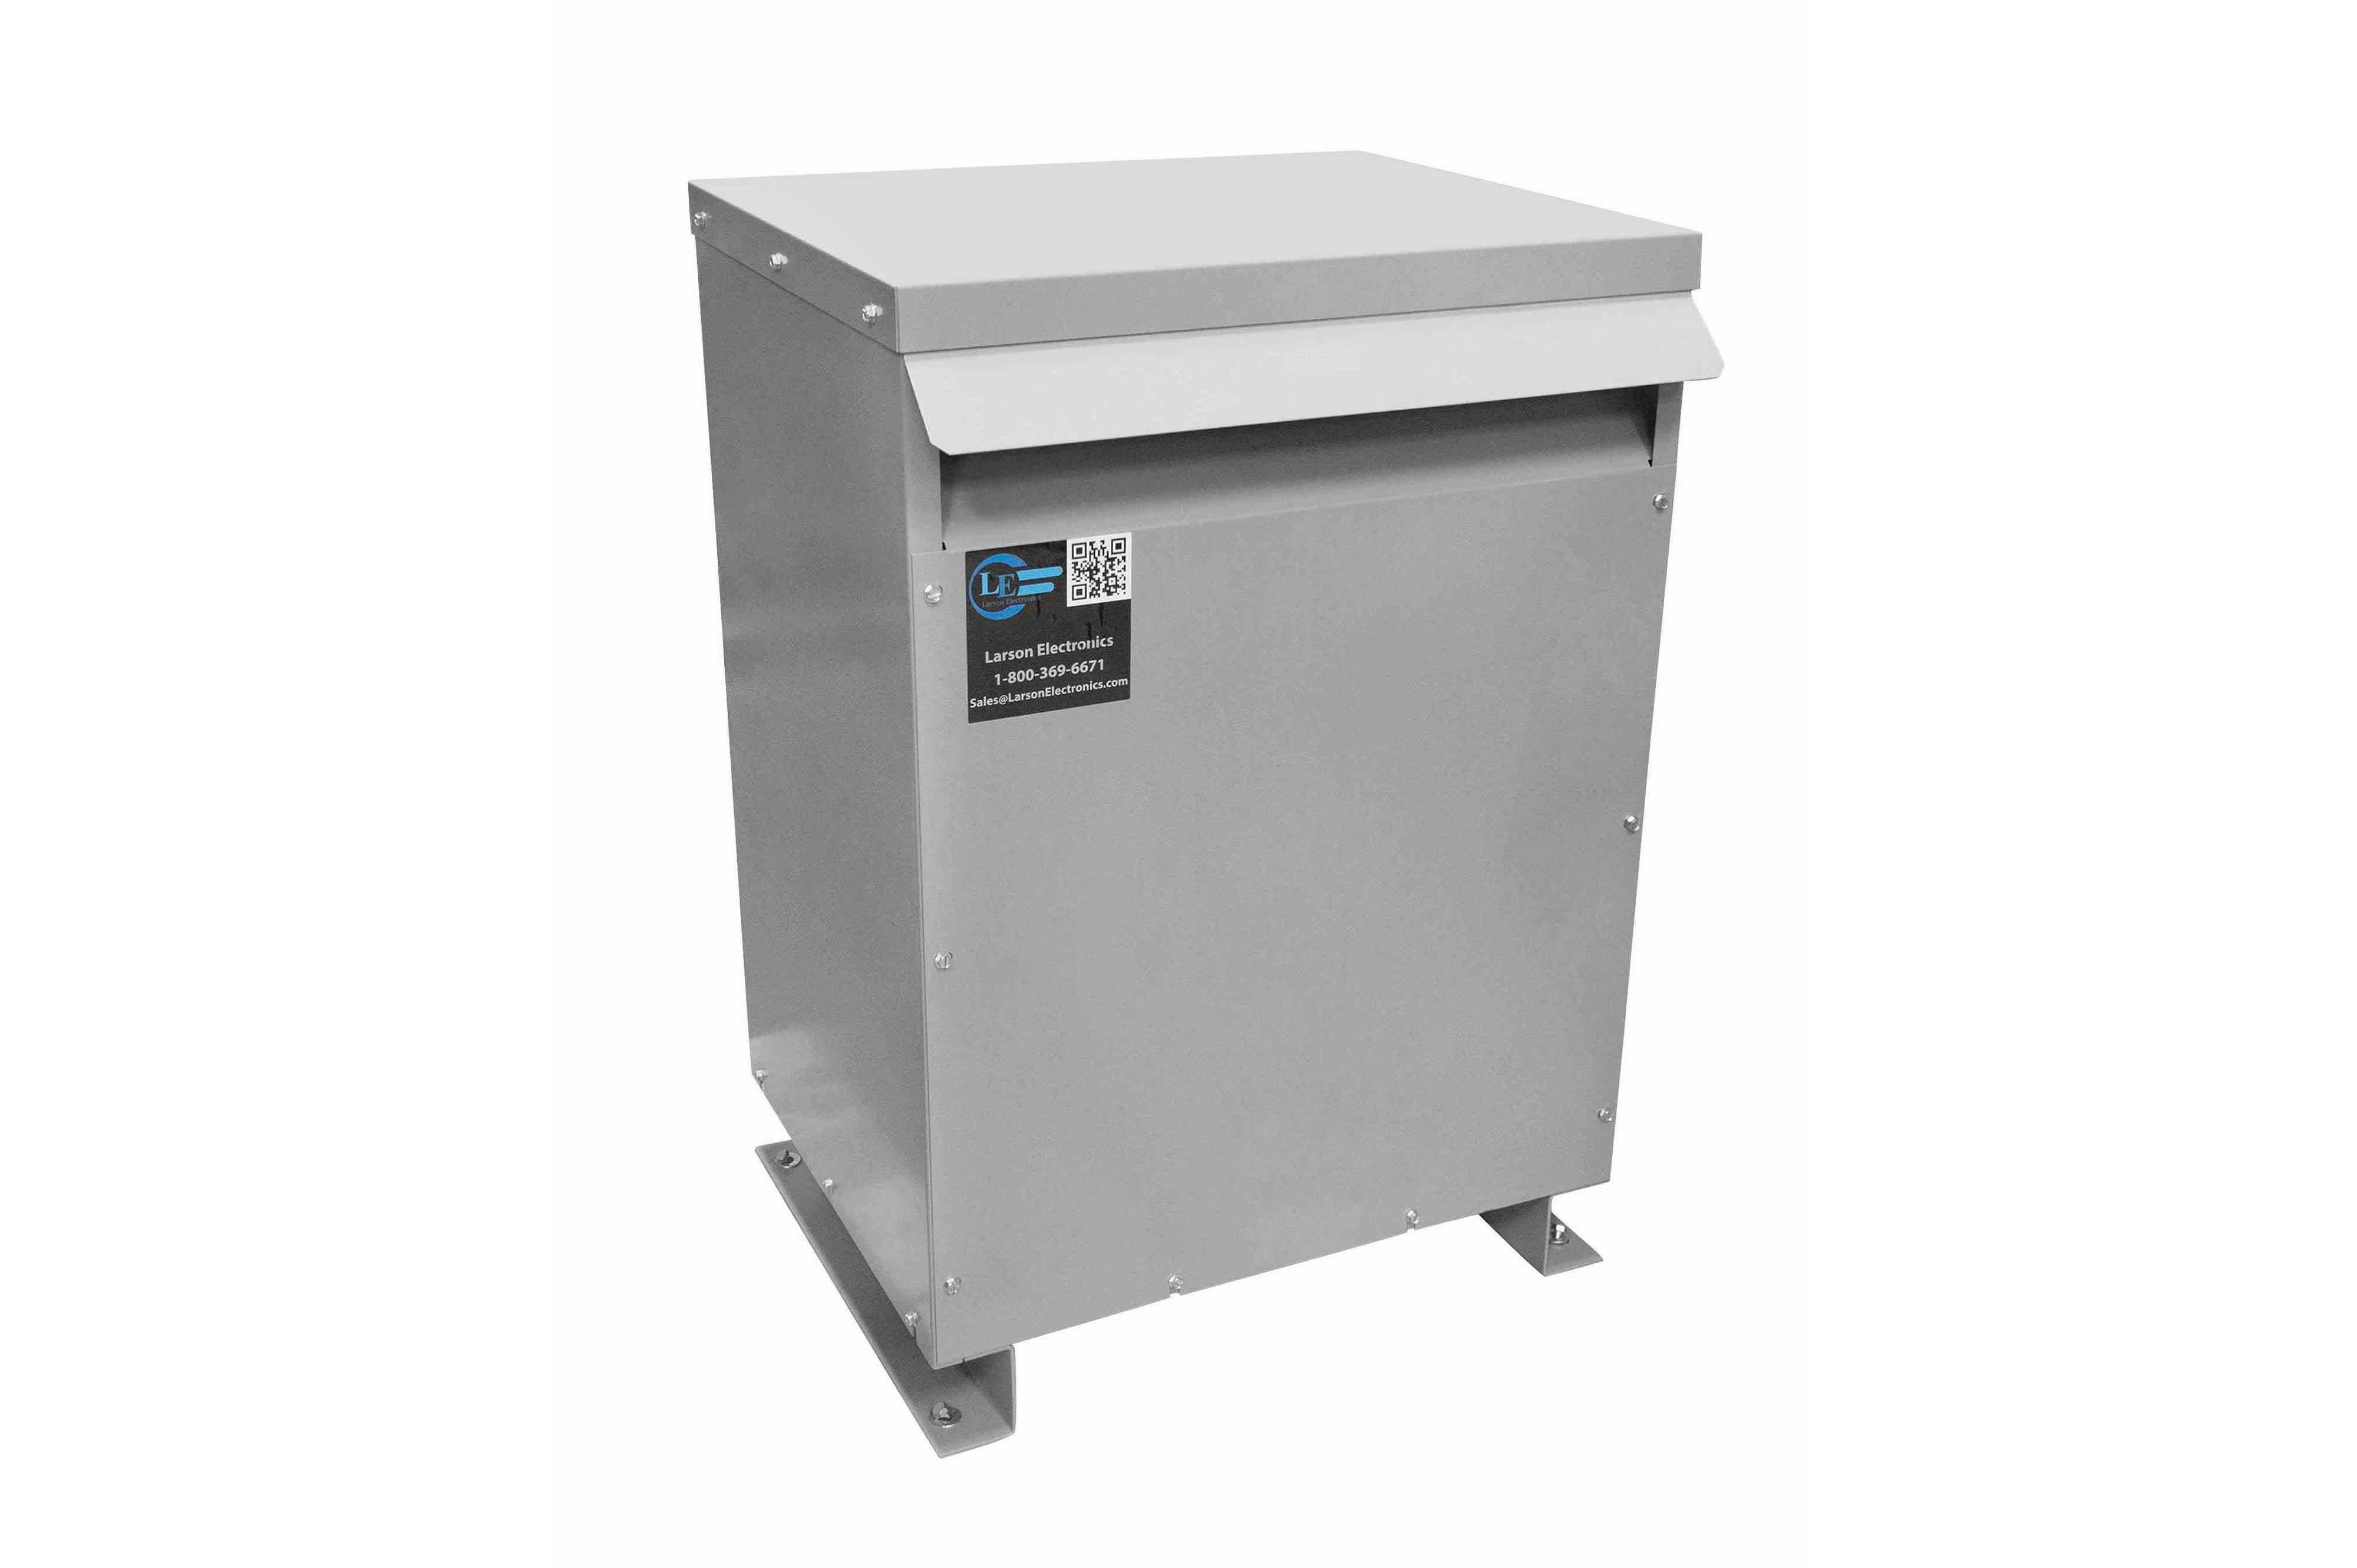 115 kVA 3PH Isolation Transformer, 240V Wye Primary, 208V Delta Secondary, N3R, Ventilated, 60 Hz